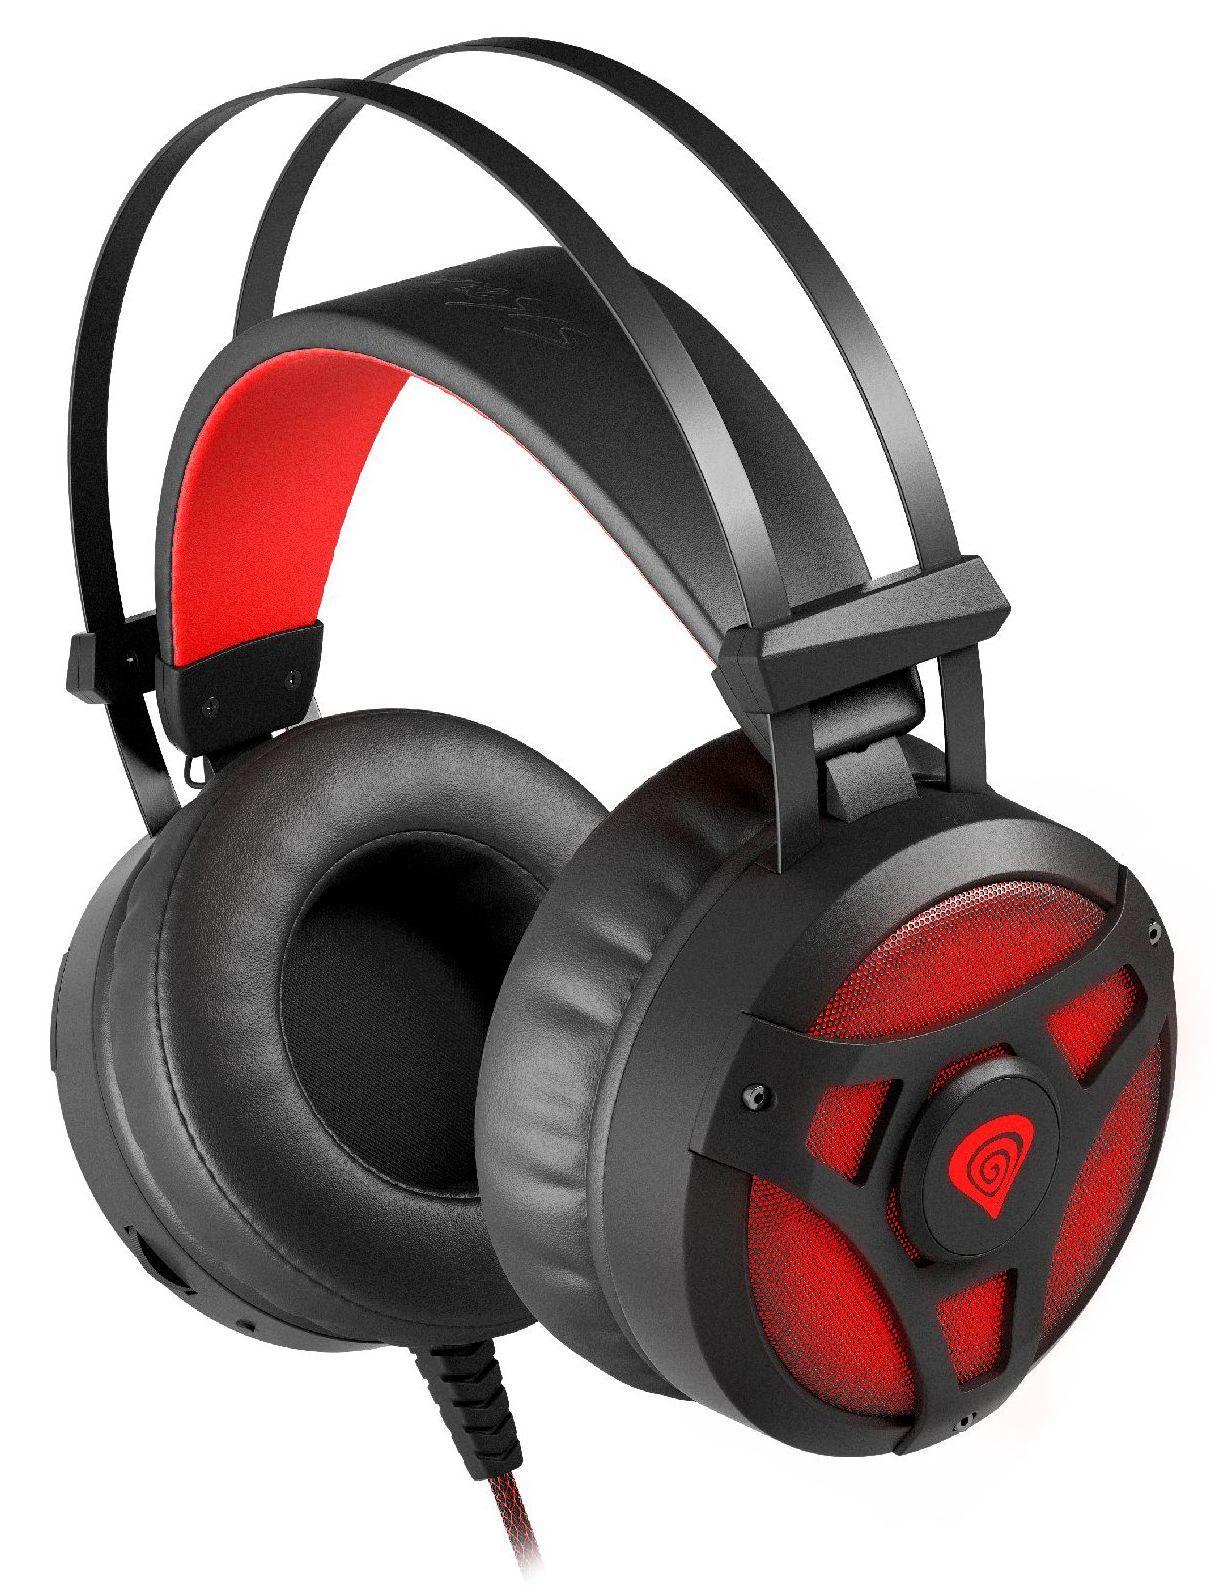 Гейминг слушалки Genesis Neon 360 - черни/червени - 3